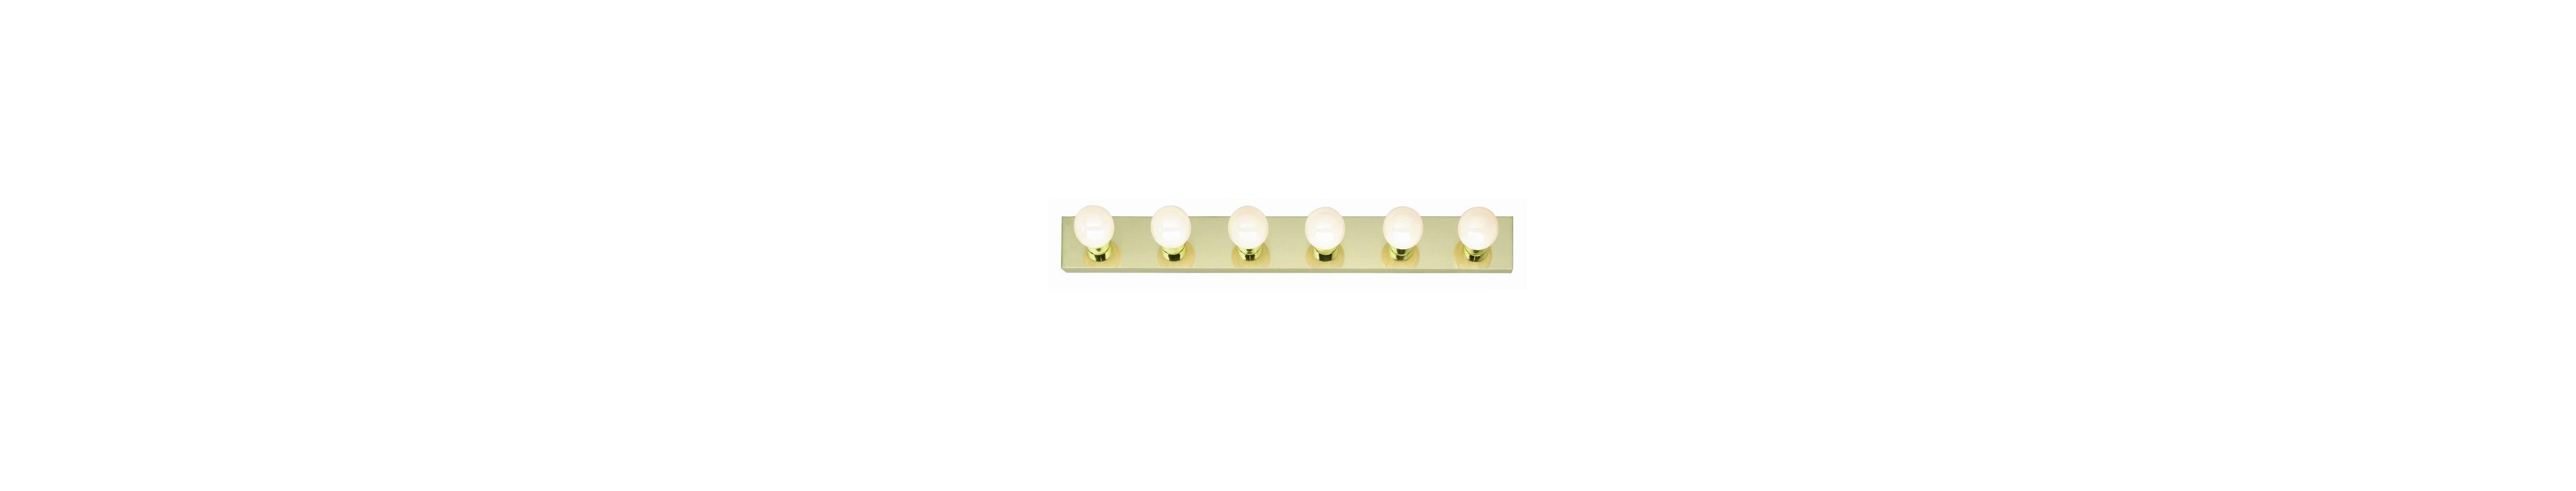 "Nuvo Lighting 77/190 Six Light 36"" Bathroom Bar Light Polished Brass"